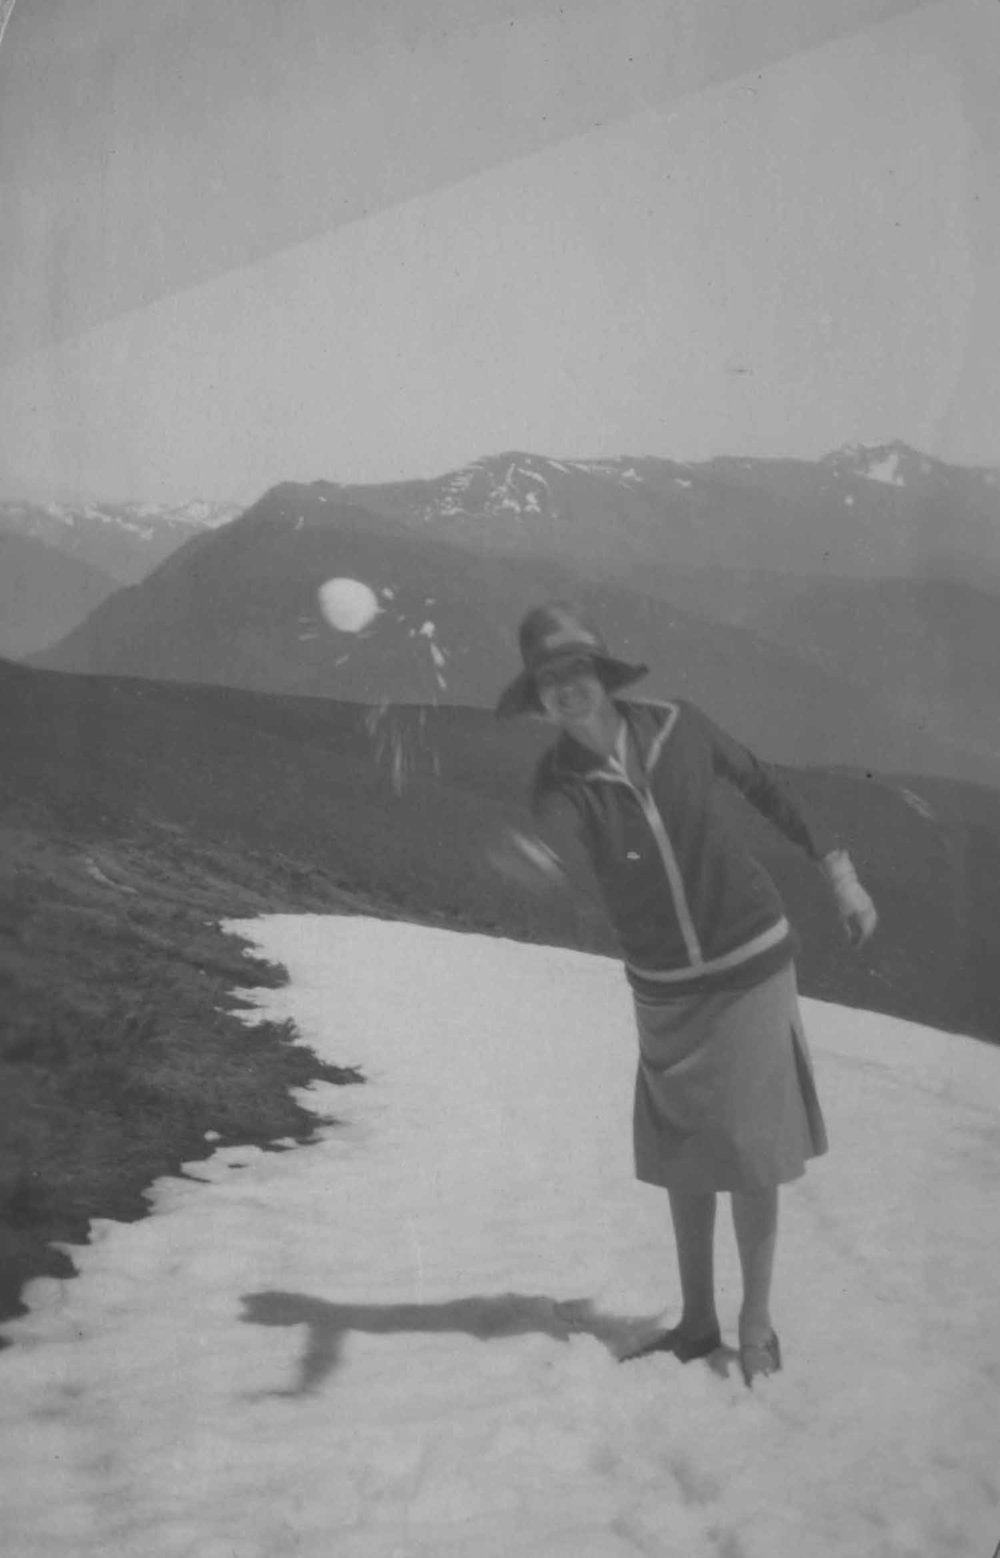 Anais 1927 4 Apr Pyranees.jpg